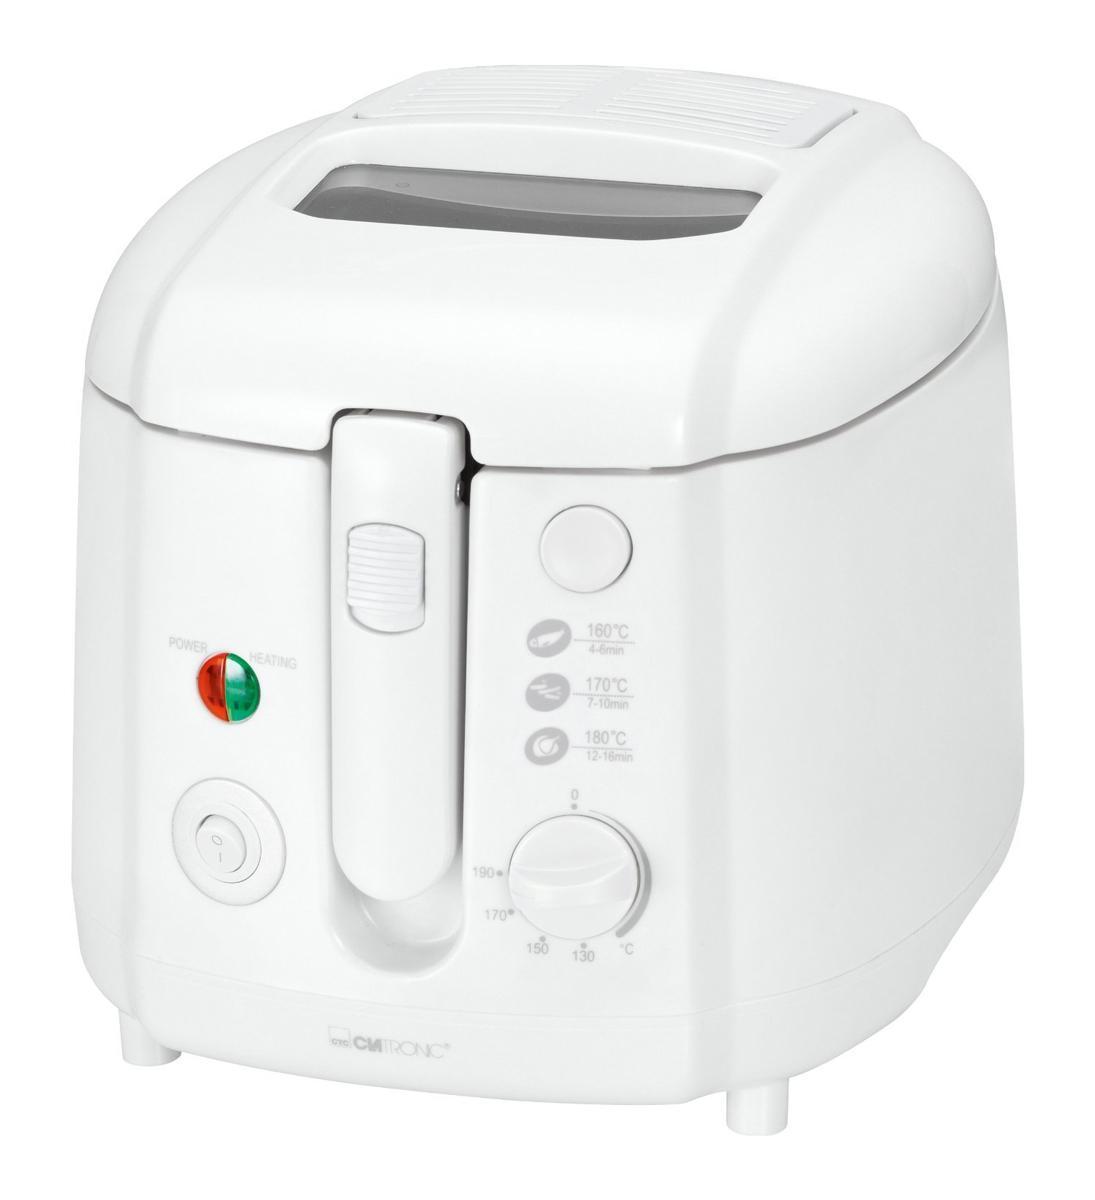 Clatronic FR 3390, White фритюрница FR 3390 weis